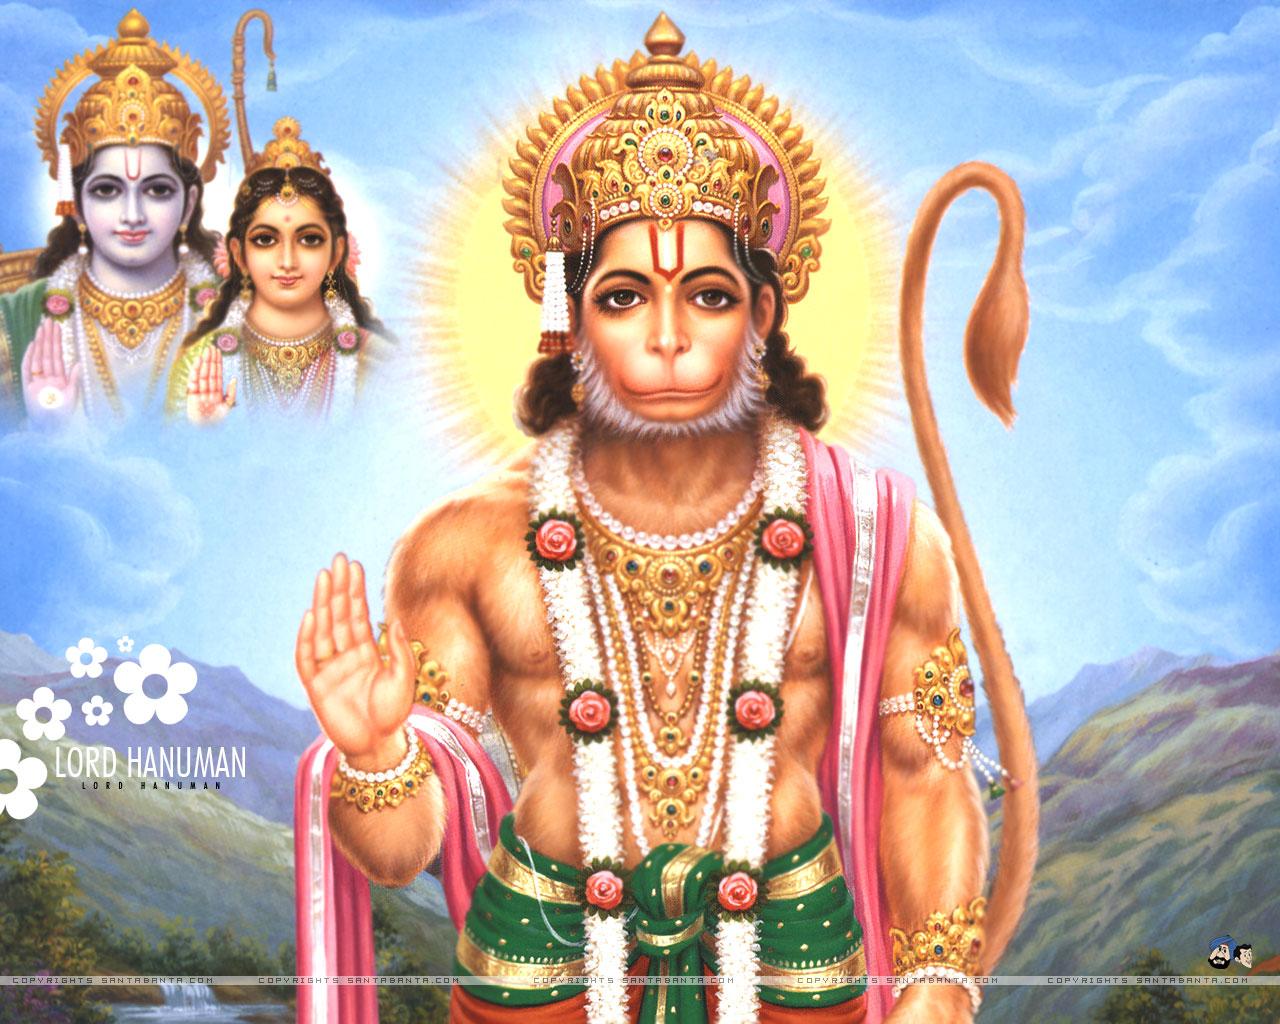 Hindu Gods Wallpaper For Desktop: Hindu Gods HD Wallpapers: Lord Hanuman Wallpapers